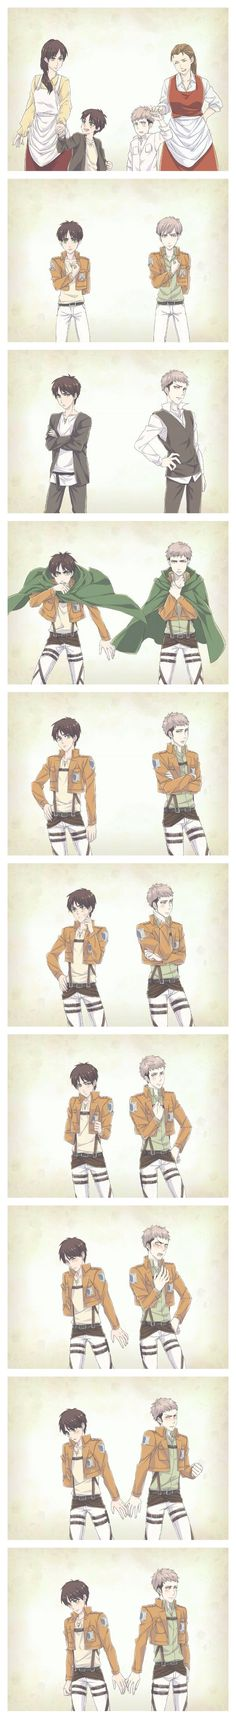 Jean x Eren is so kawaii